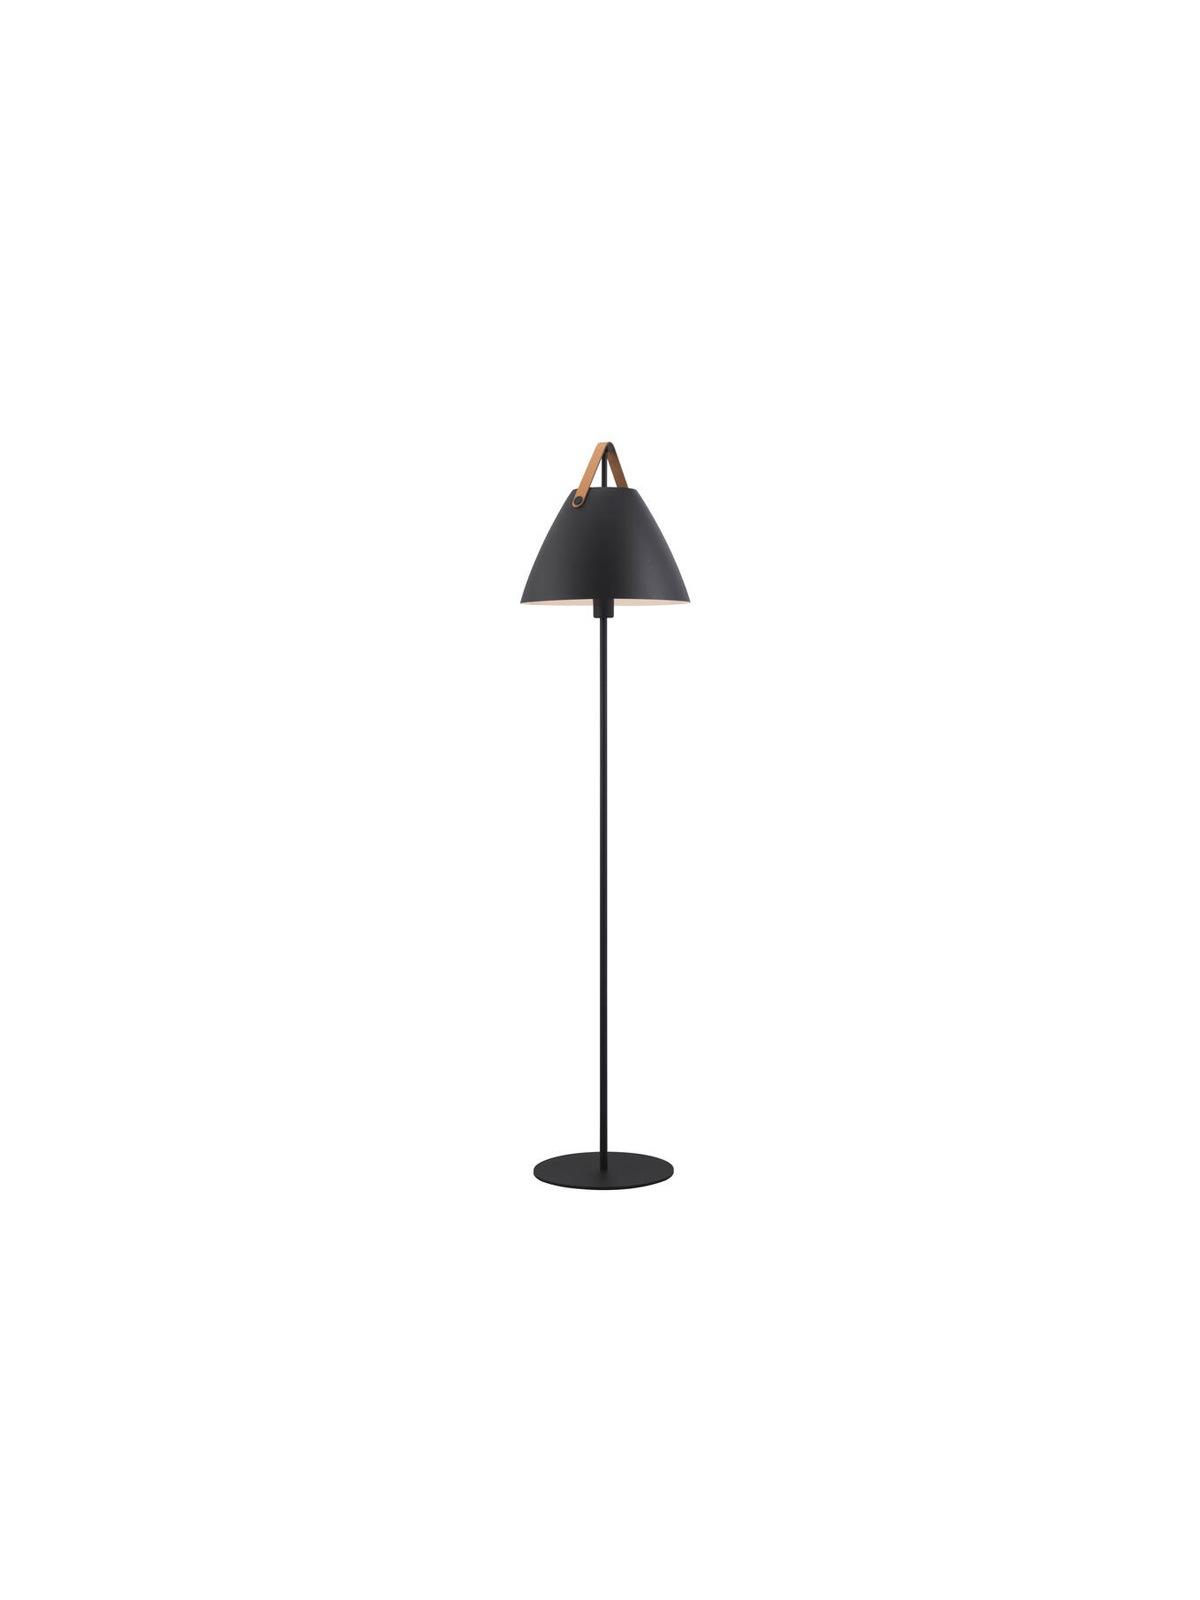 Nordlux Stehlampe Strap Floor Design for the People DFTP DesignOrt Lampen Berlin